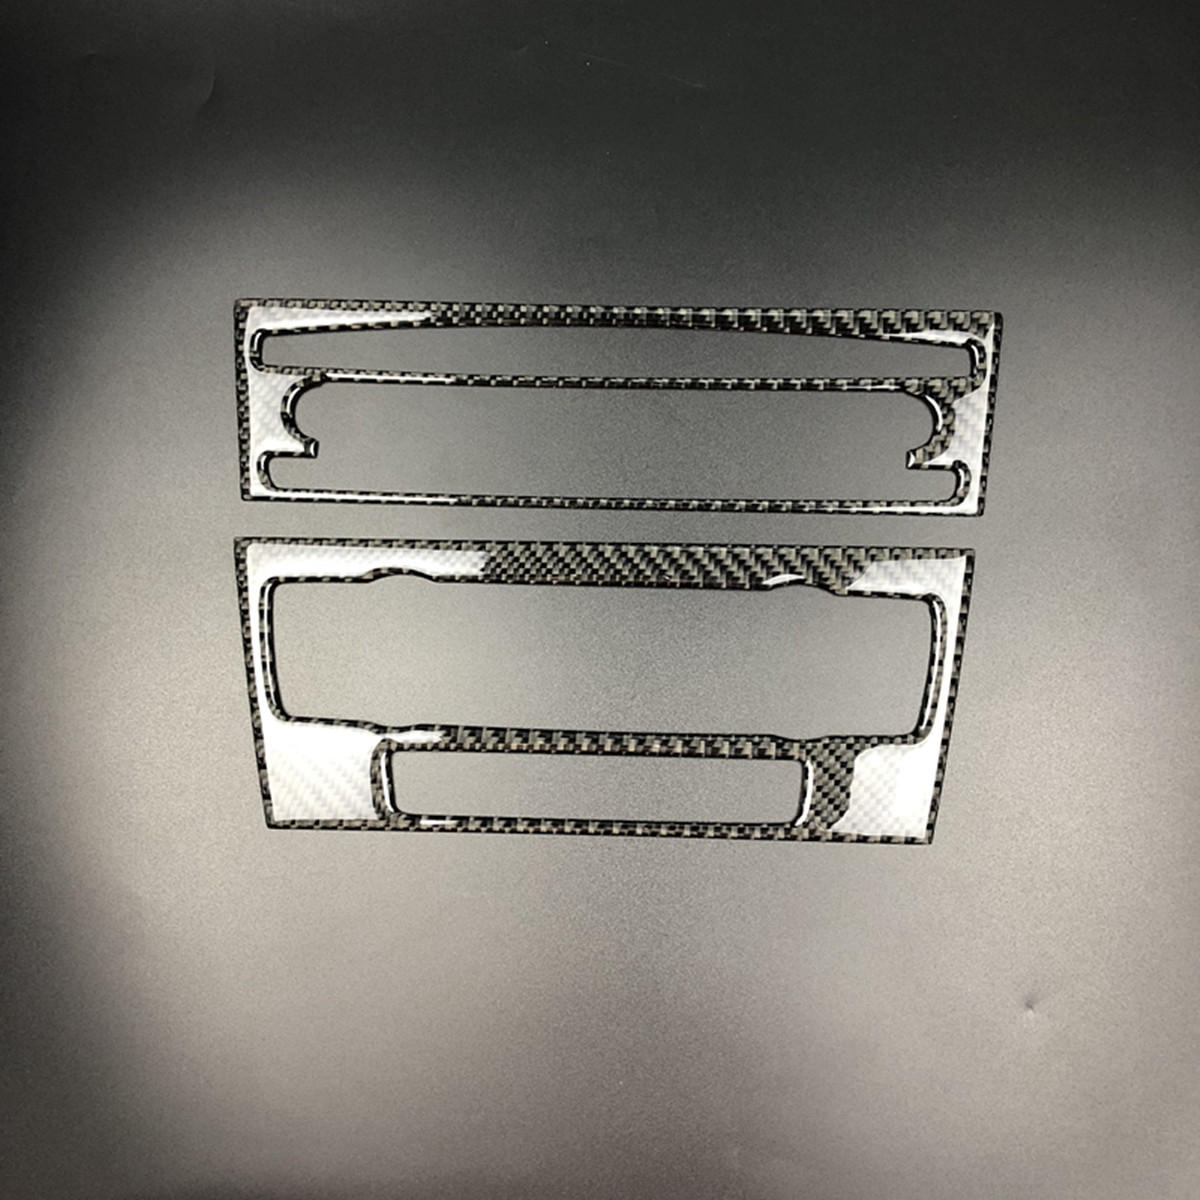 Car Air Conditioning CD Control Panel Trim Carbon Fiber Decoration for BMW E90 E92 E93 3 Series Interior Accessories Car styling